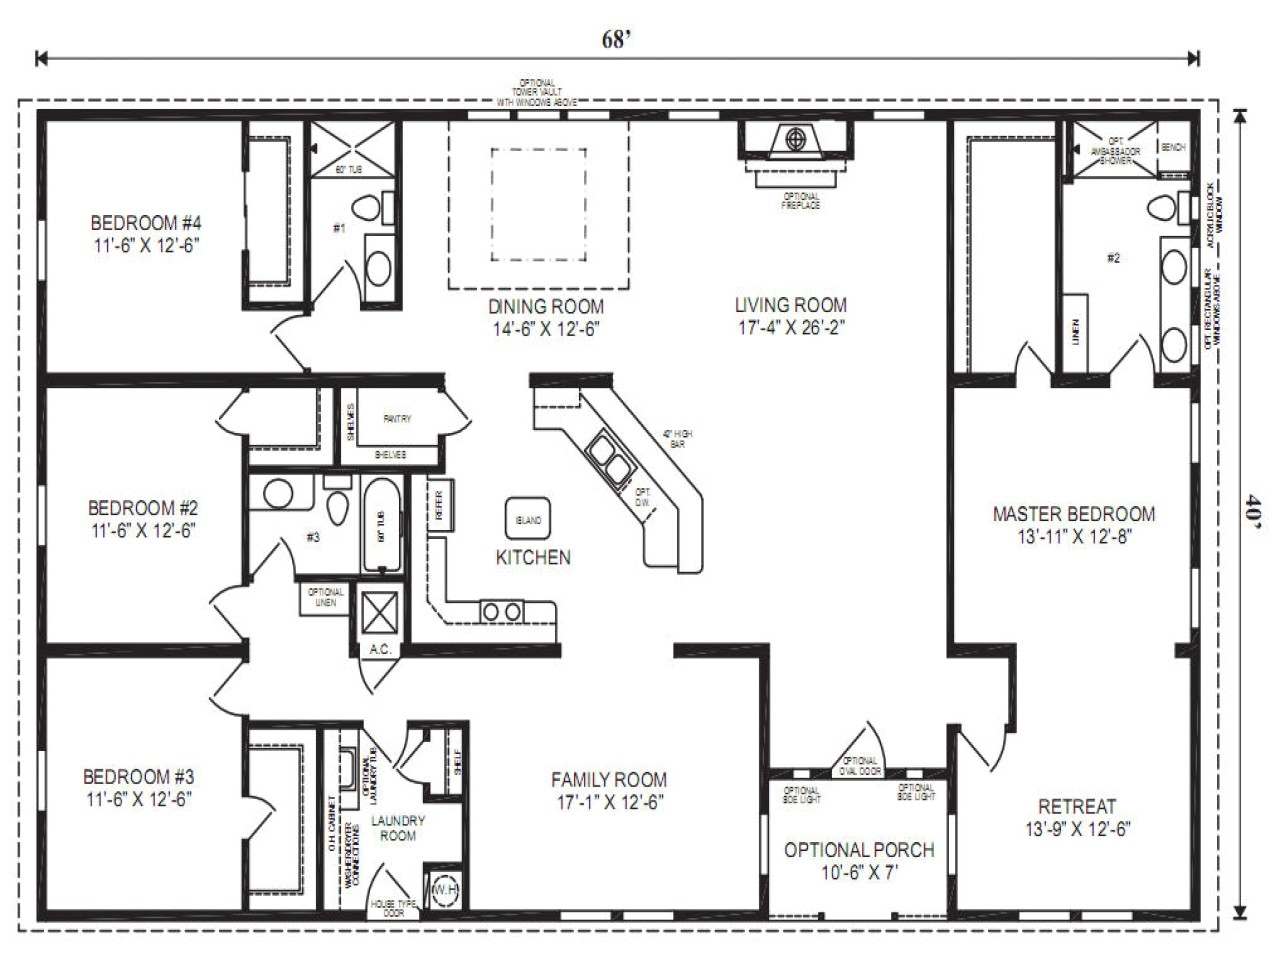 03c77ca8edbed139 mobile modular home floor plans modular homes prices